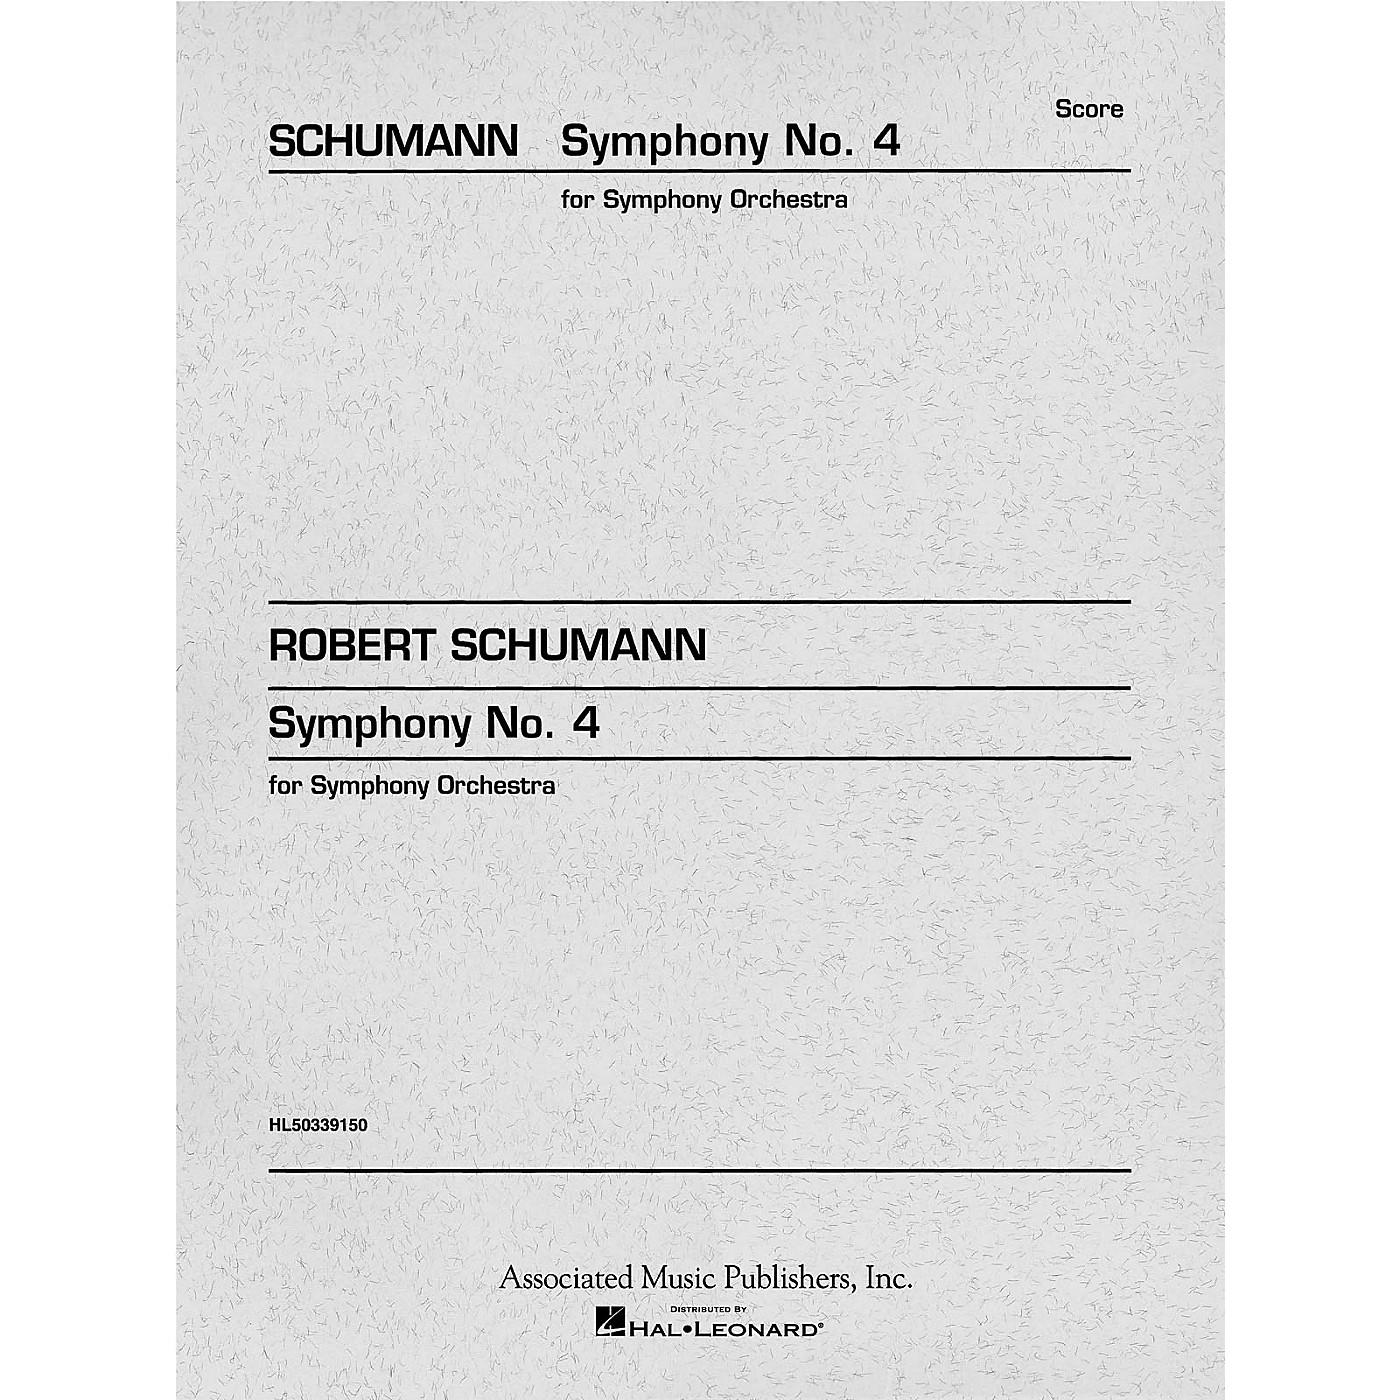 G. Schirmer Symphony No. 4 in D minor, Op. 120 (Study Score No. 159) Study Score Series Composed by Robert Schumann thumbnail